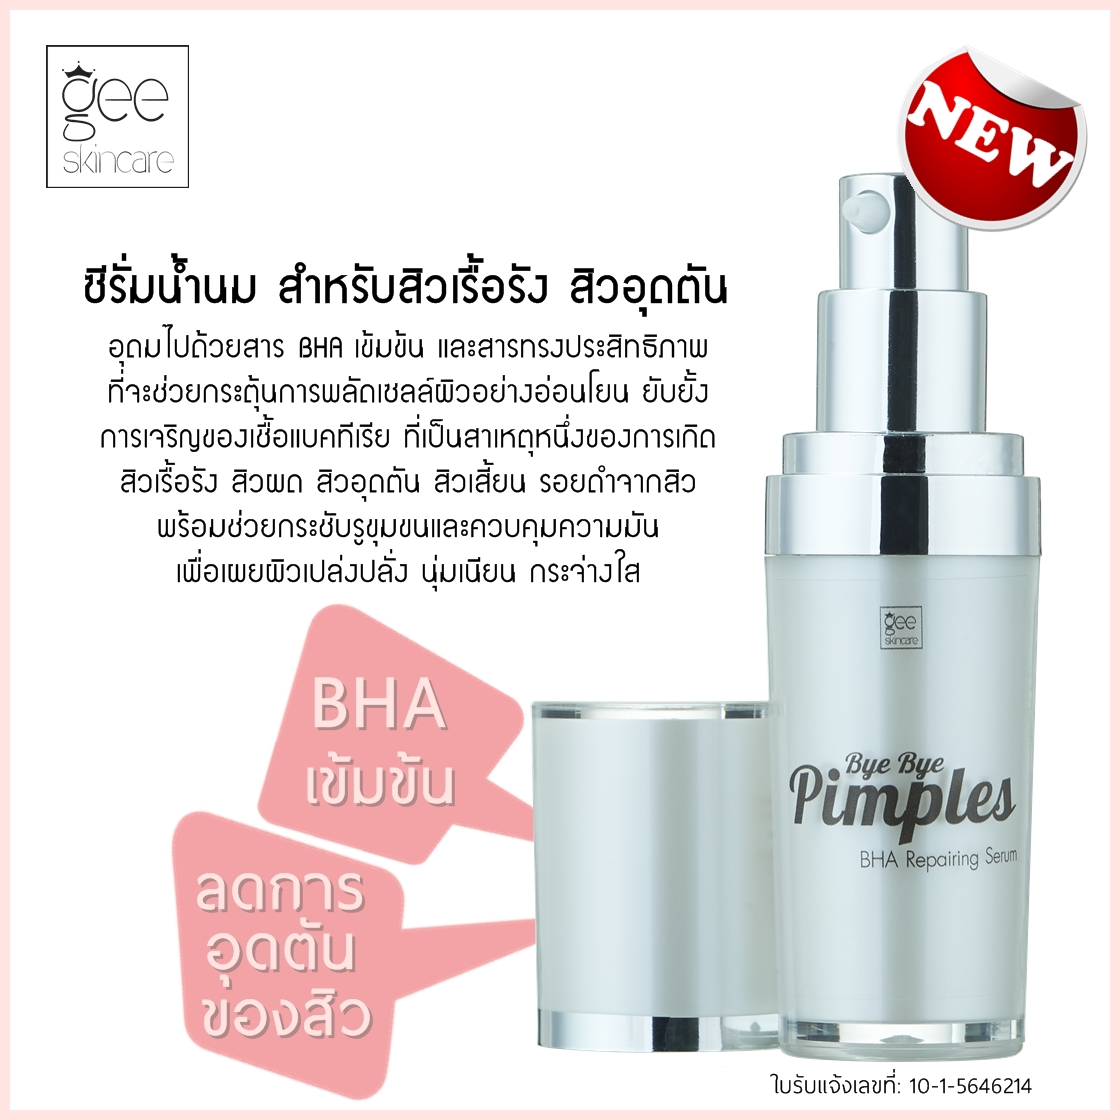 Bye Bye Pimples BHA Repairing Serum (15g.) New!!!